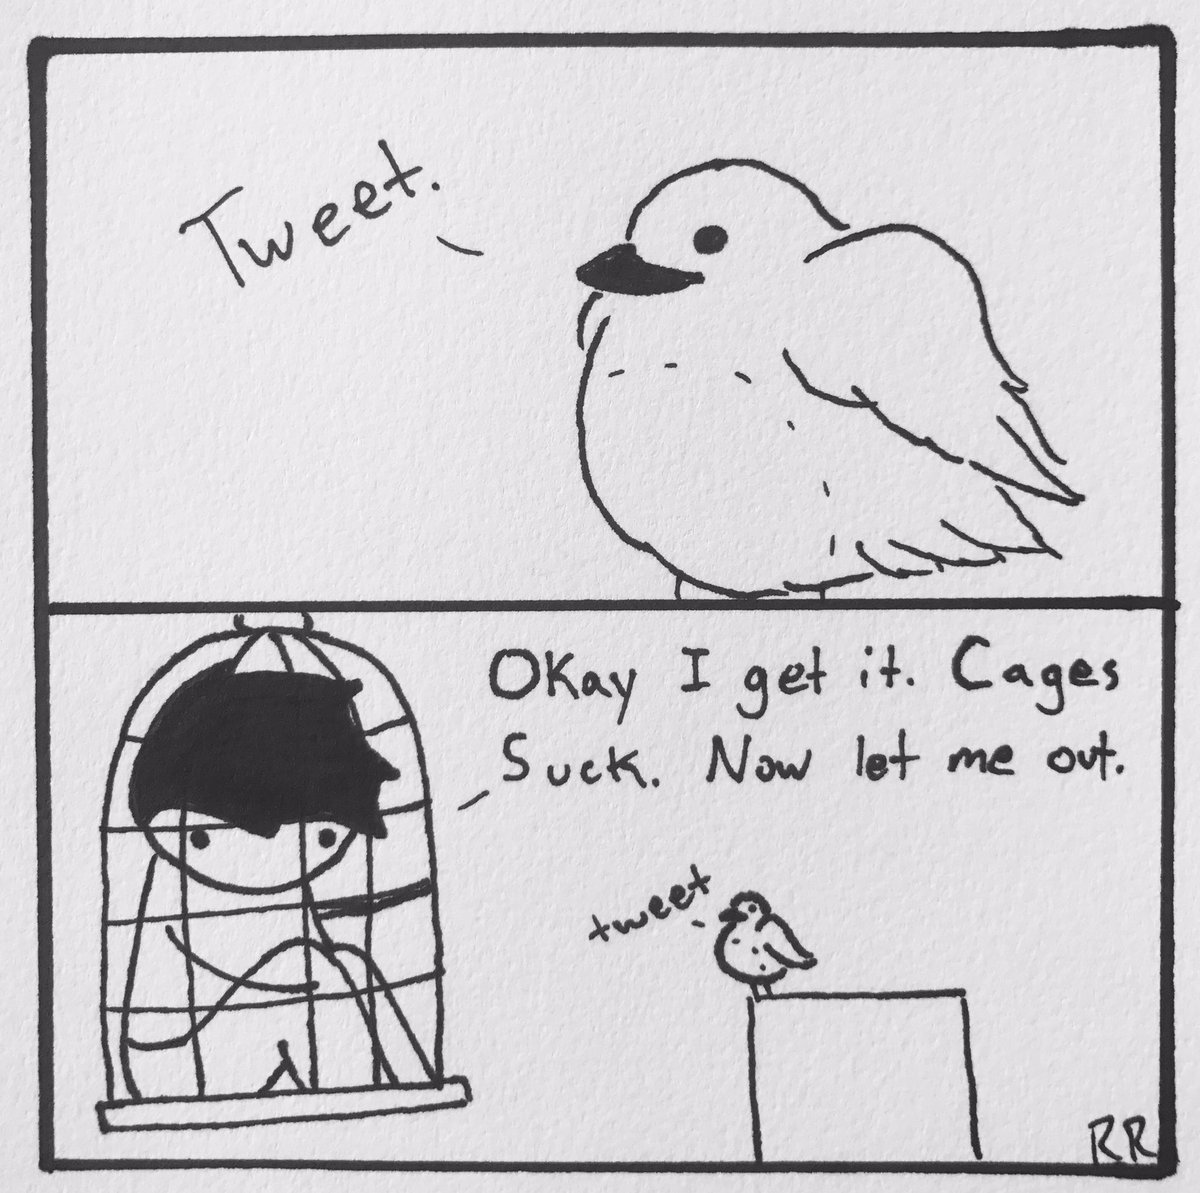 I love fluffy birds. #bird #birb #cage #comic #cute #webcomic #animal #floof #tweet #comics #webcomics #art #FridayMotivation<br>http://pic.twitter.com/GCcse4QFP1